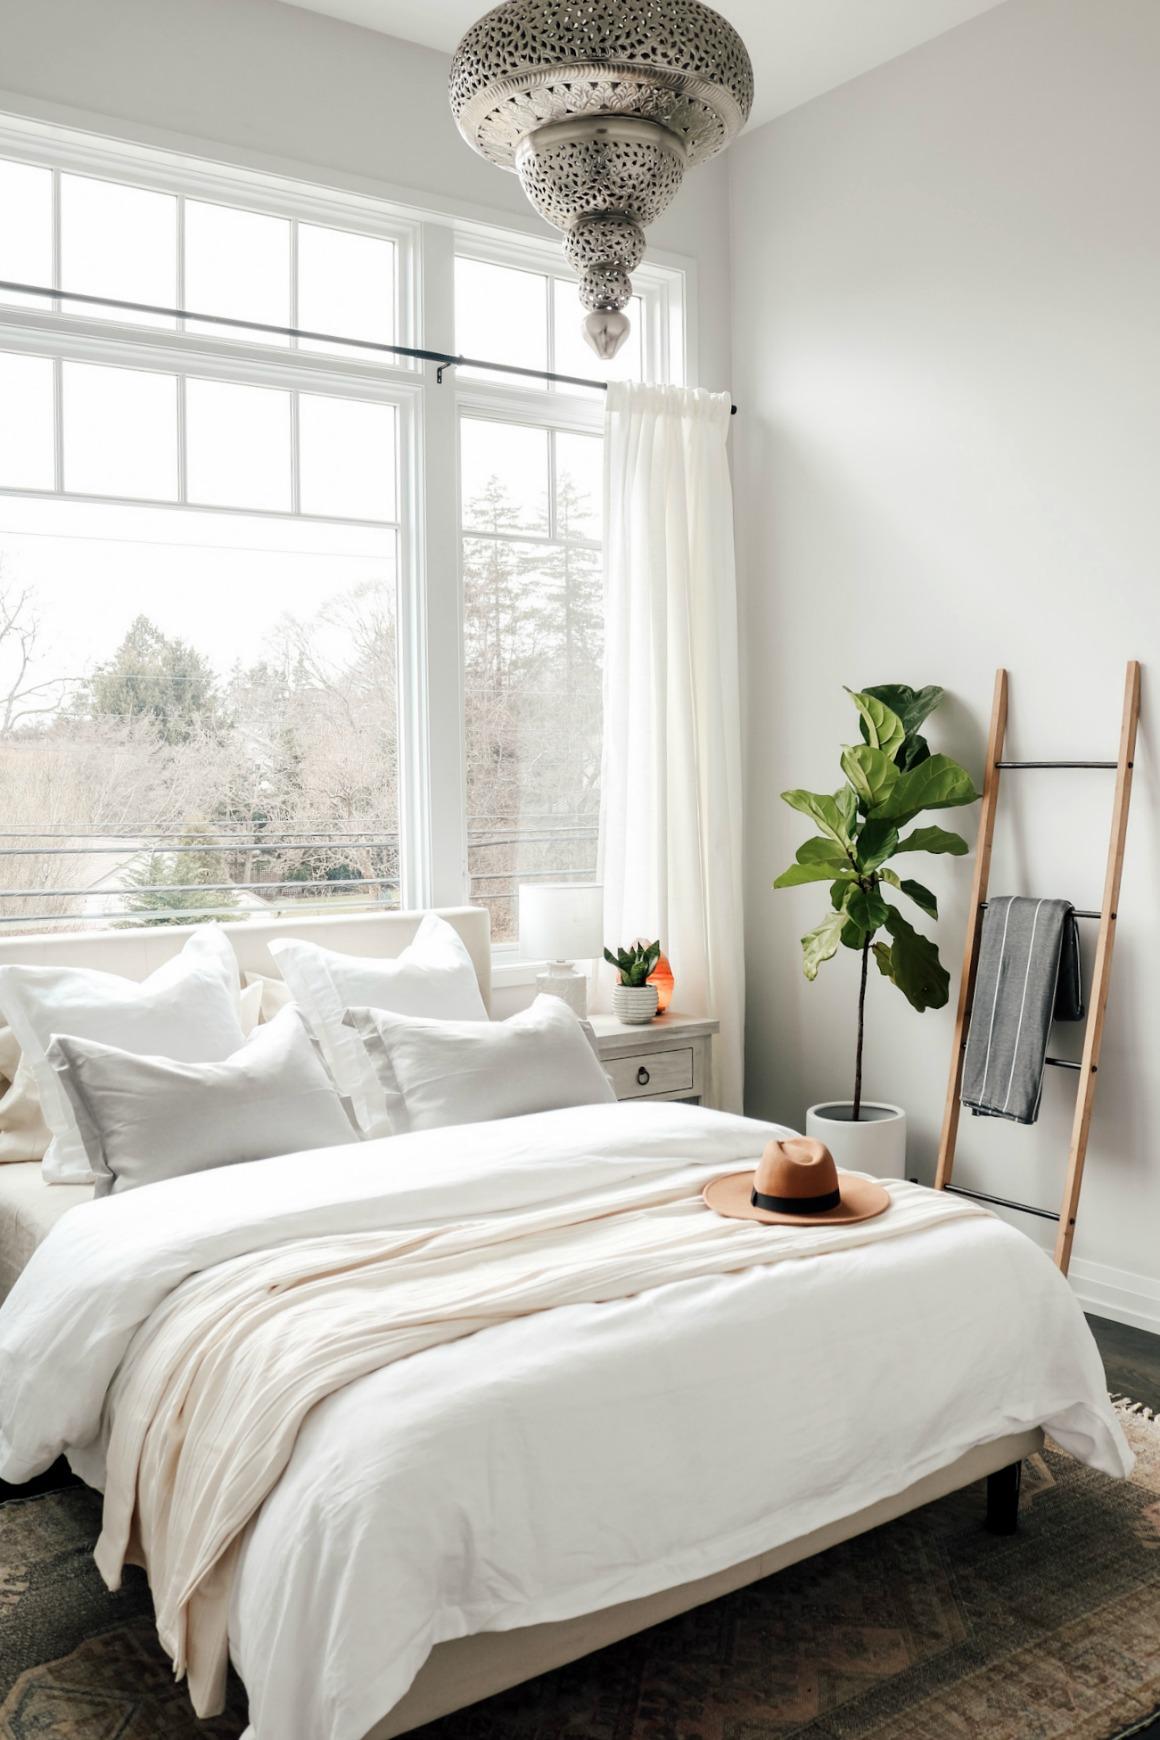 White Boho Master Bedroom Makeover - Nesting With Grace on Boho Master Bedroom Ideas  id=15664